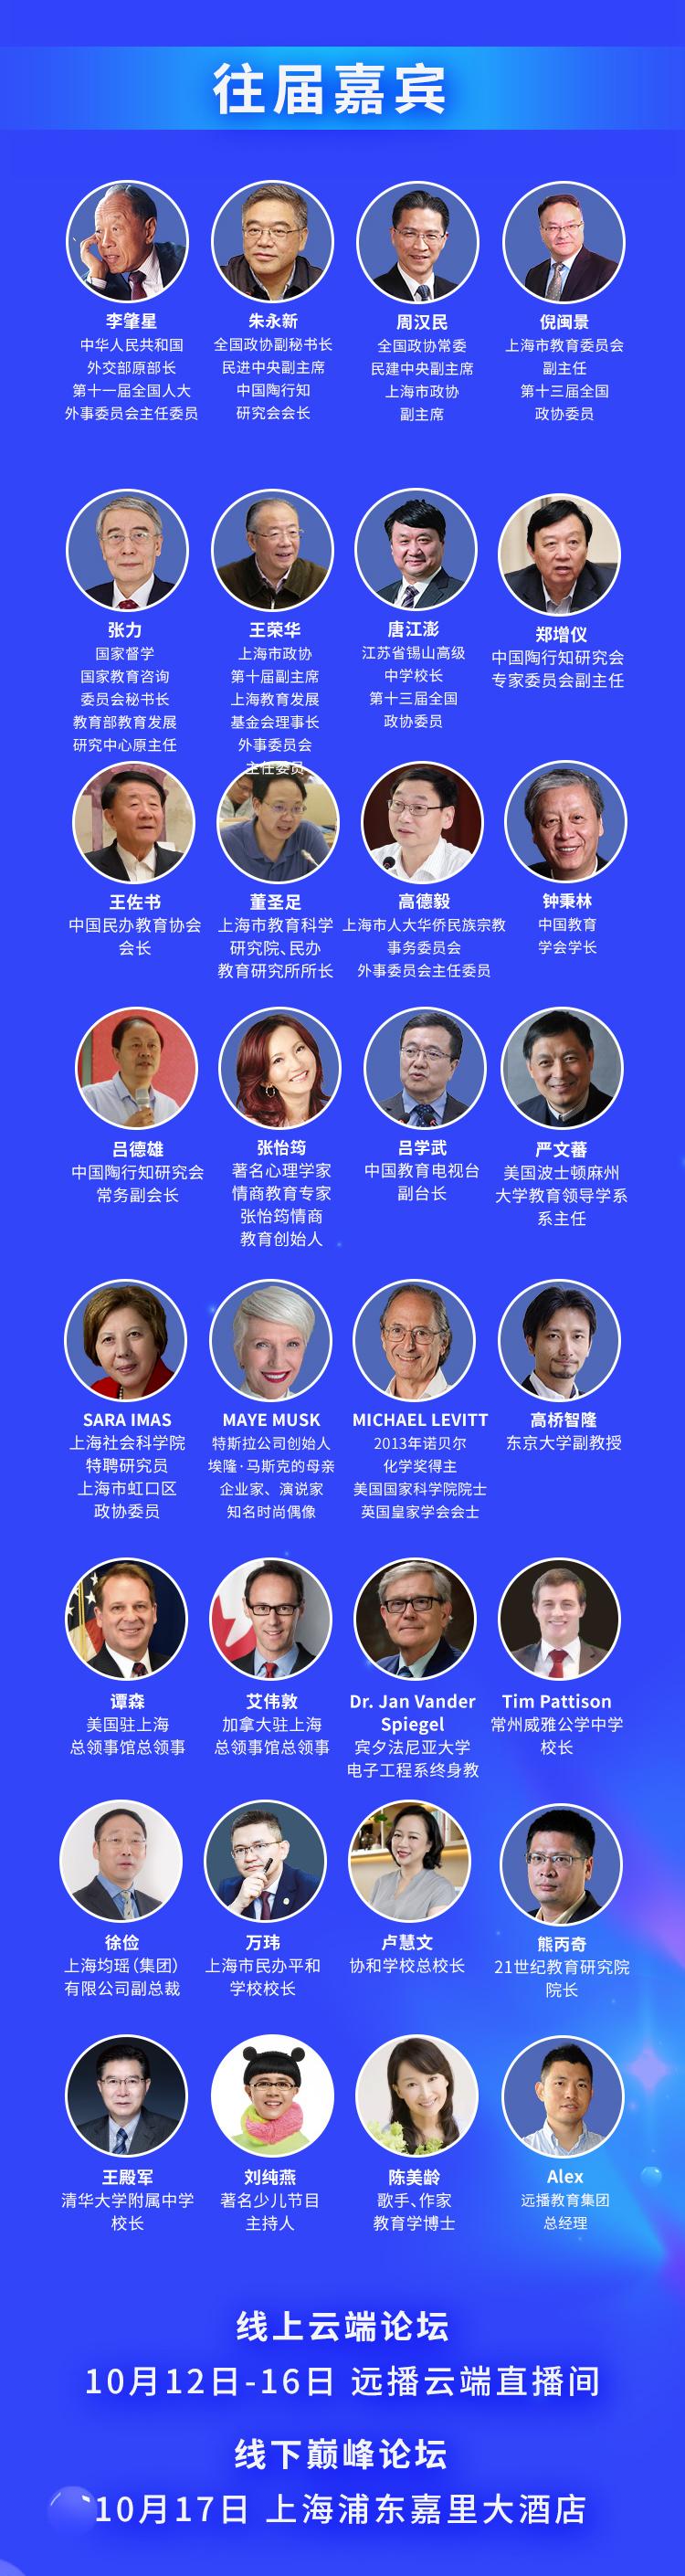 ieic国际教育创新大会嘉宾